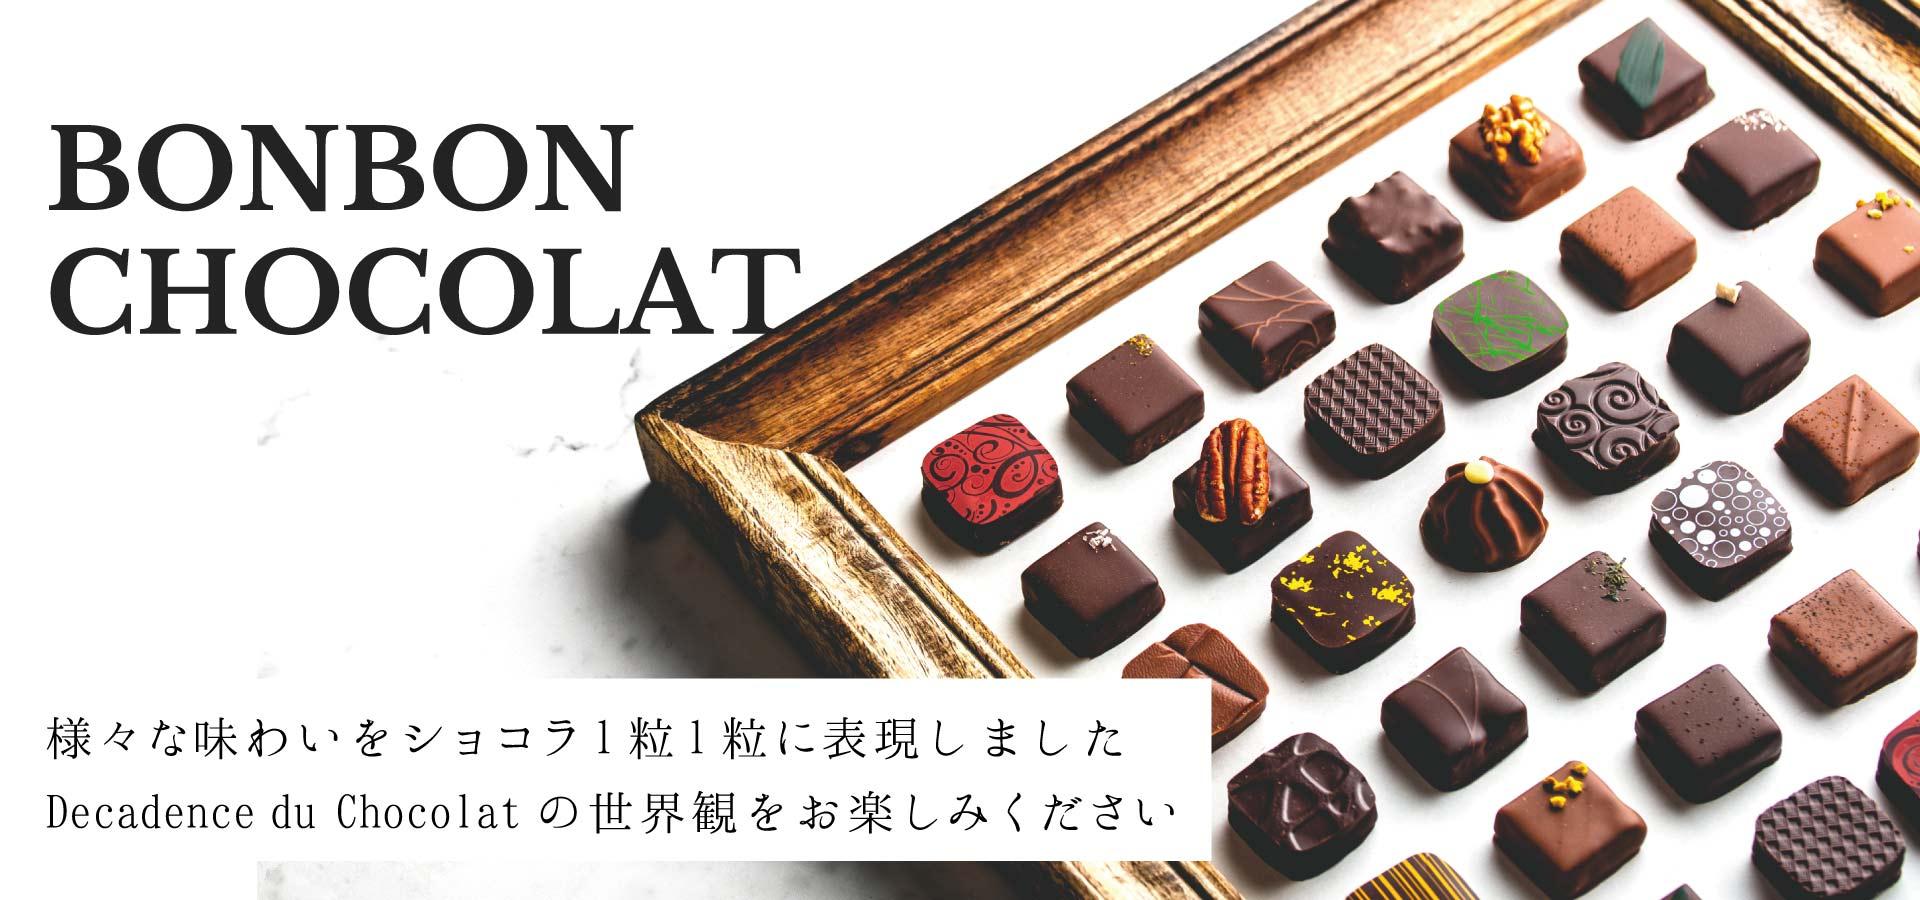 Madeleines au chocolat/マドレーヌ オ ショコラ